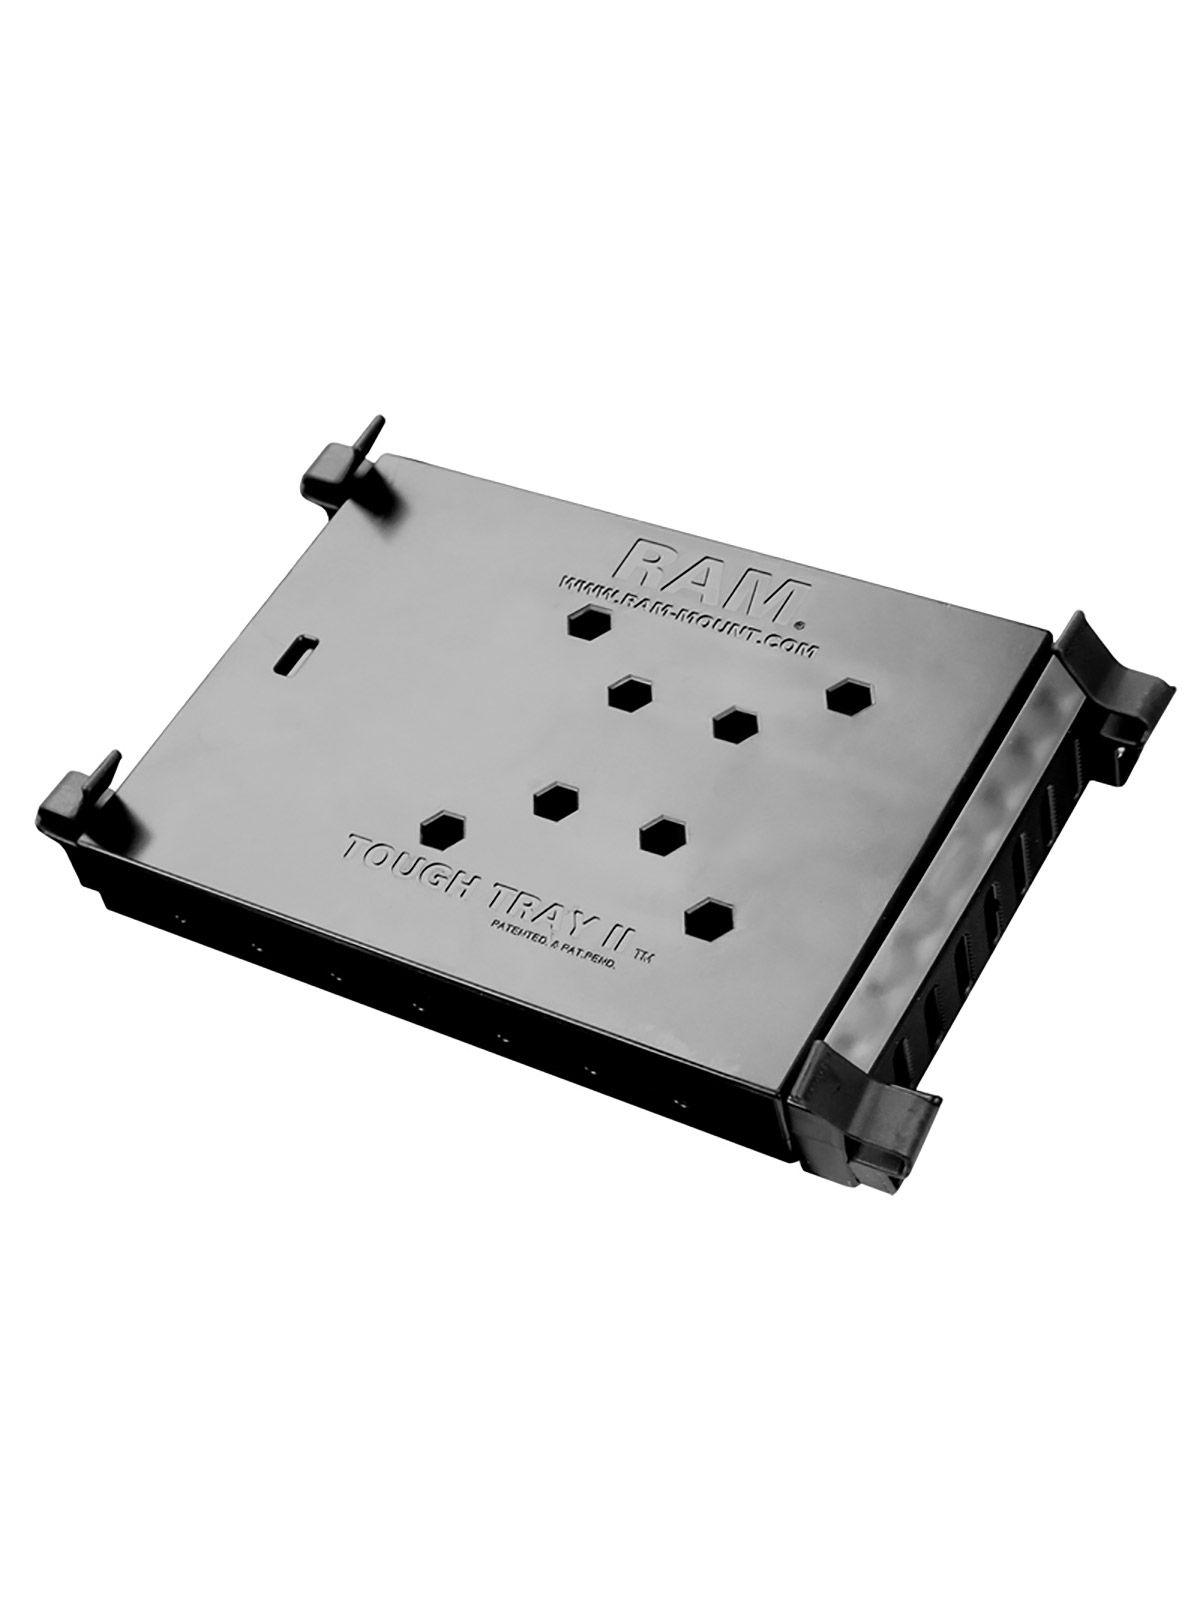 RAM Mounts Tough-Tray II, Universal Halteschale - Laptops / Netbooks / Tablets, AMPS-Anbindung